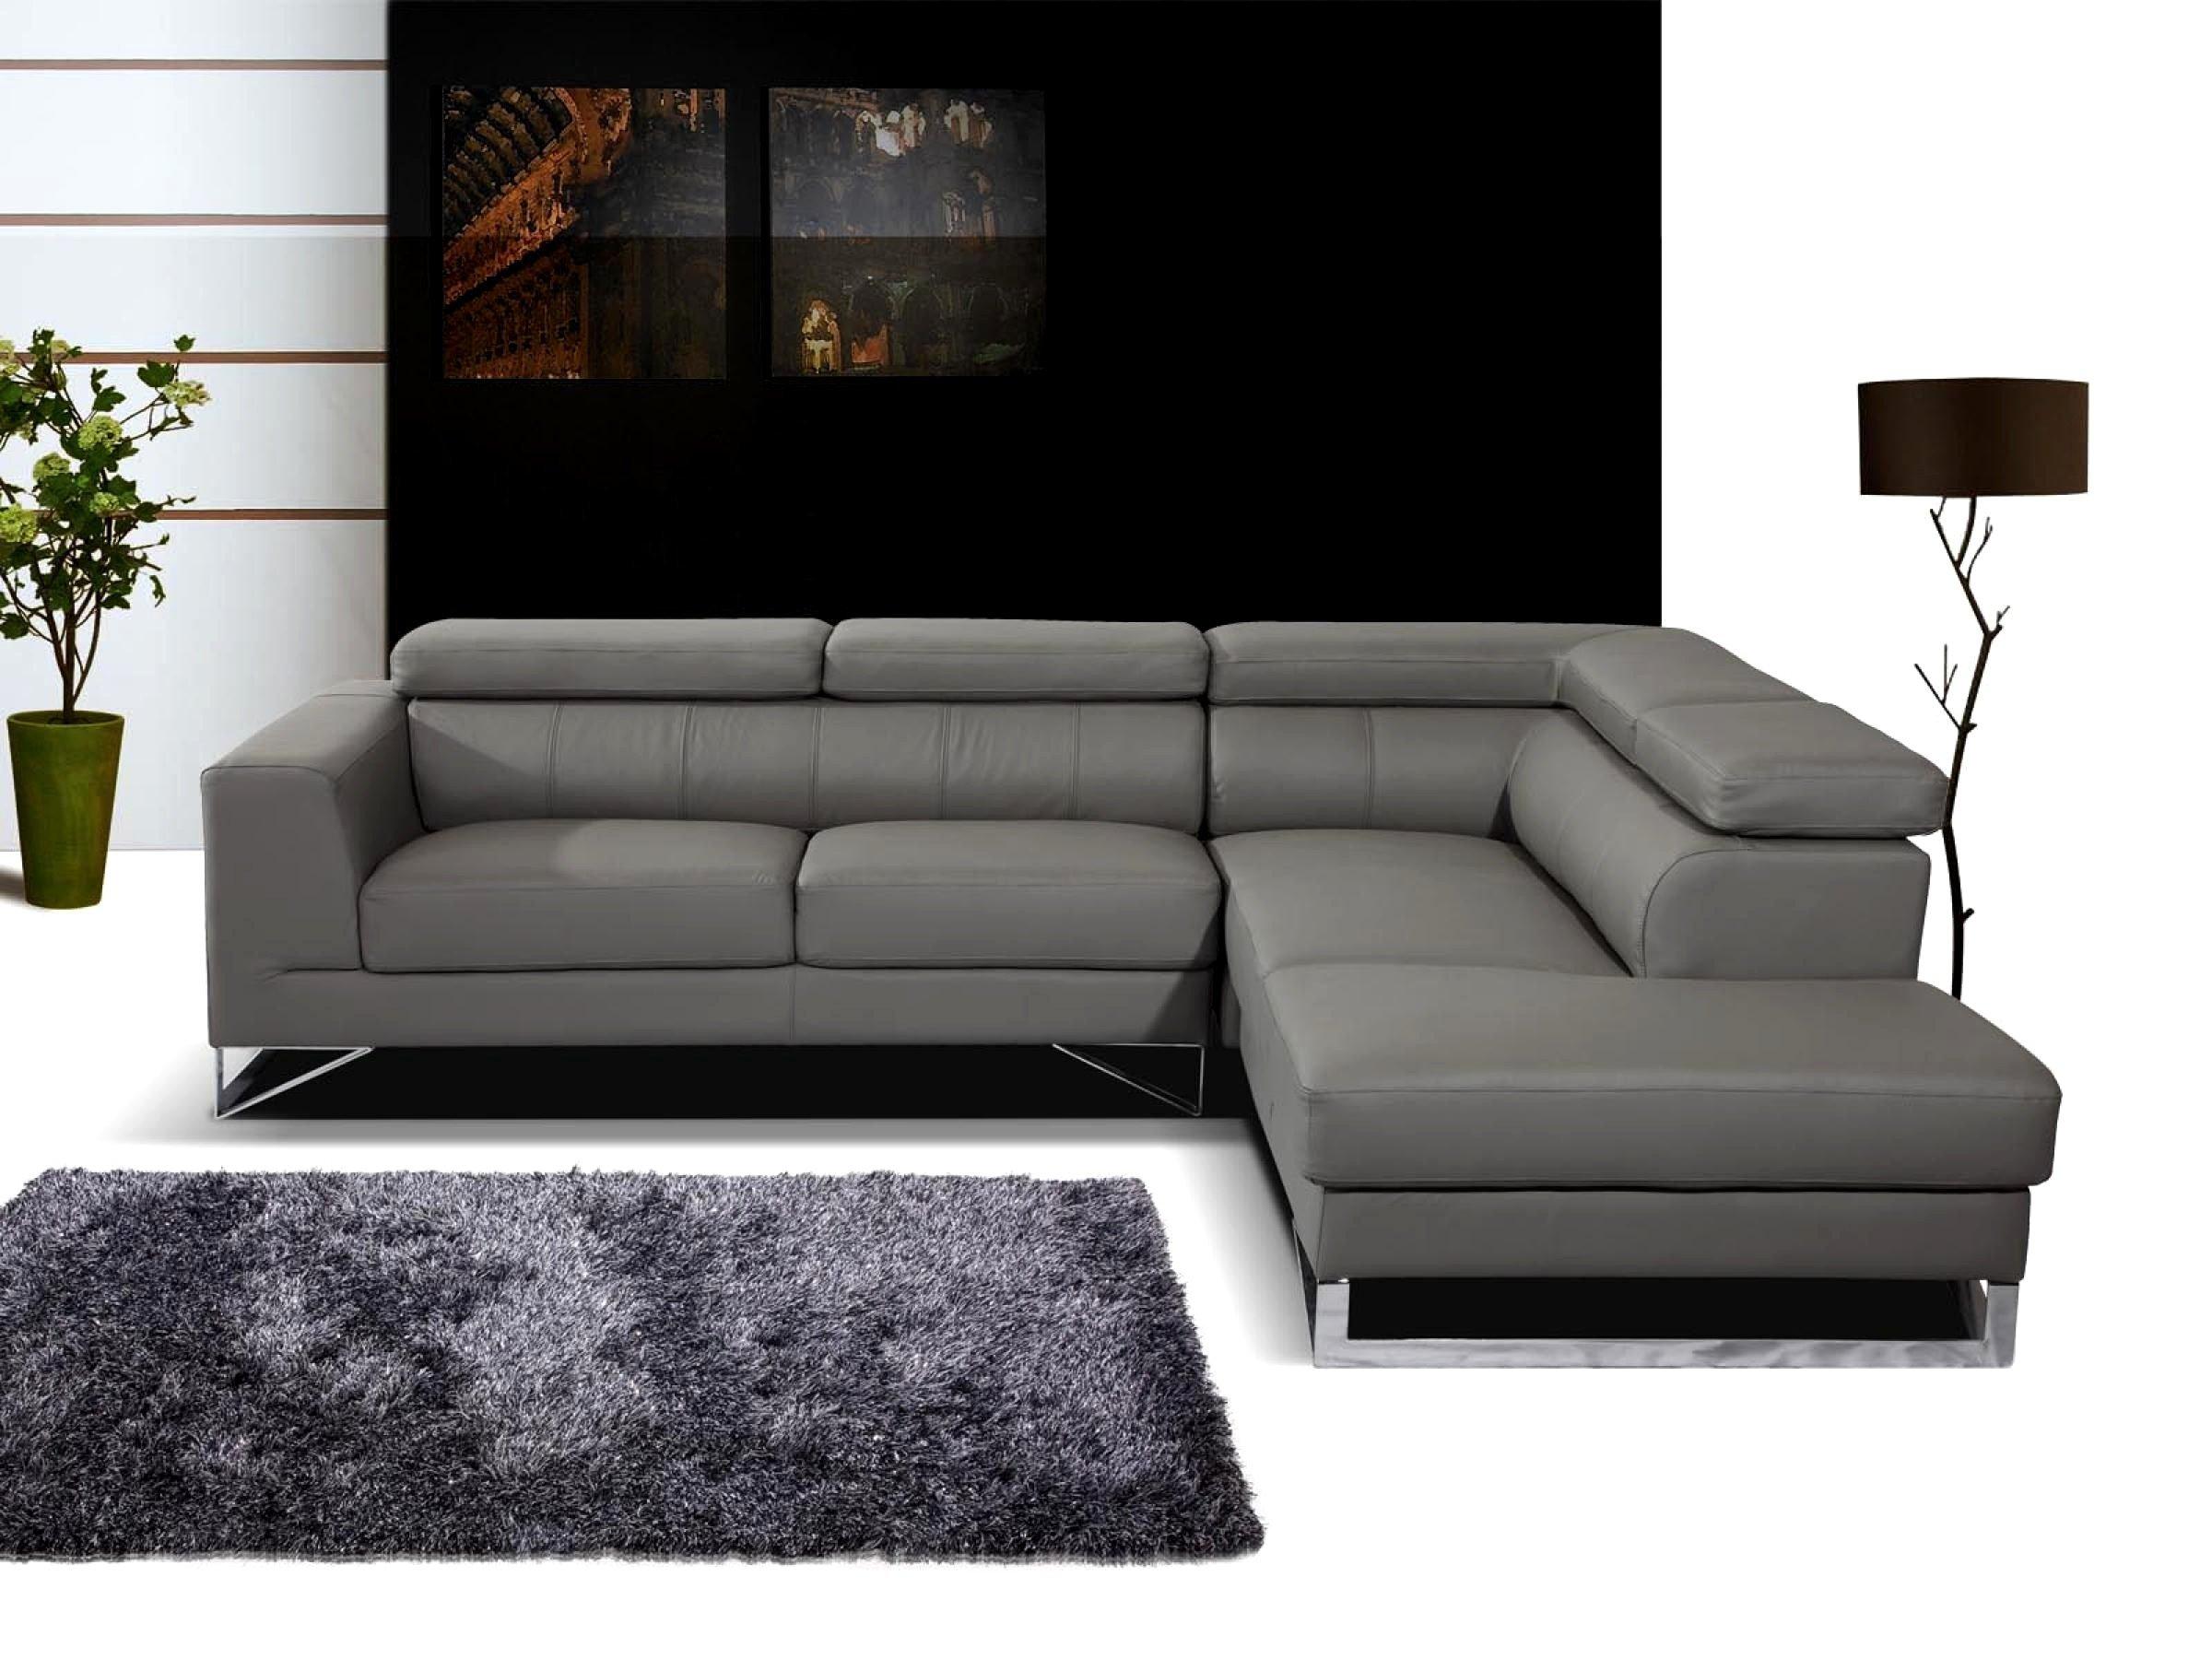 canape angle tissu conforama luxe photos canape convertible conforama. Black Bedroom Furniture Sets. Home Design Ideas